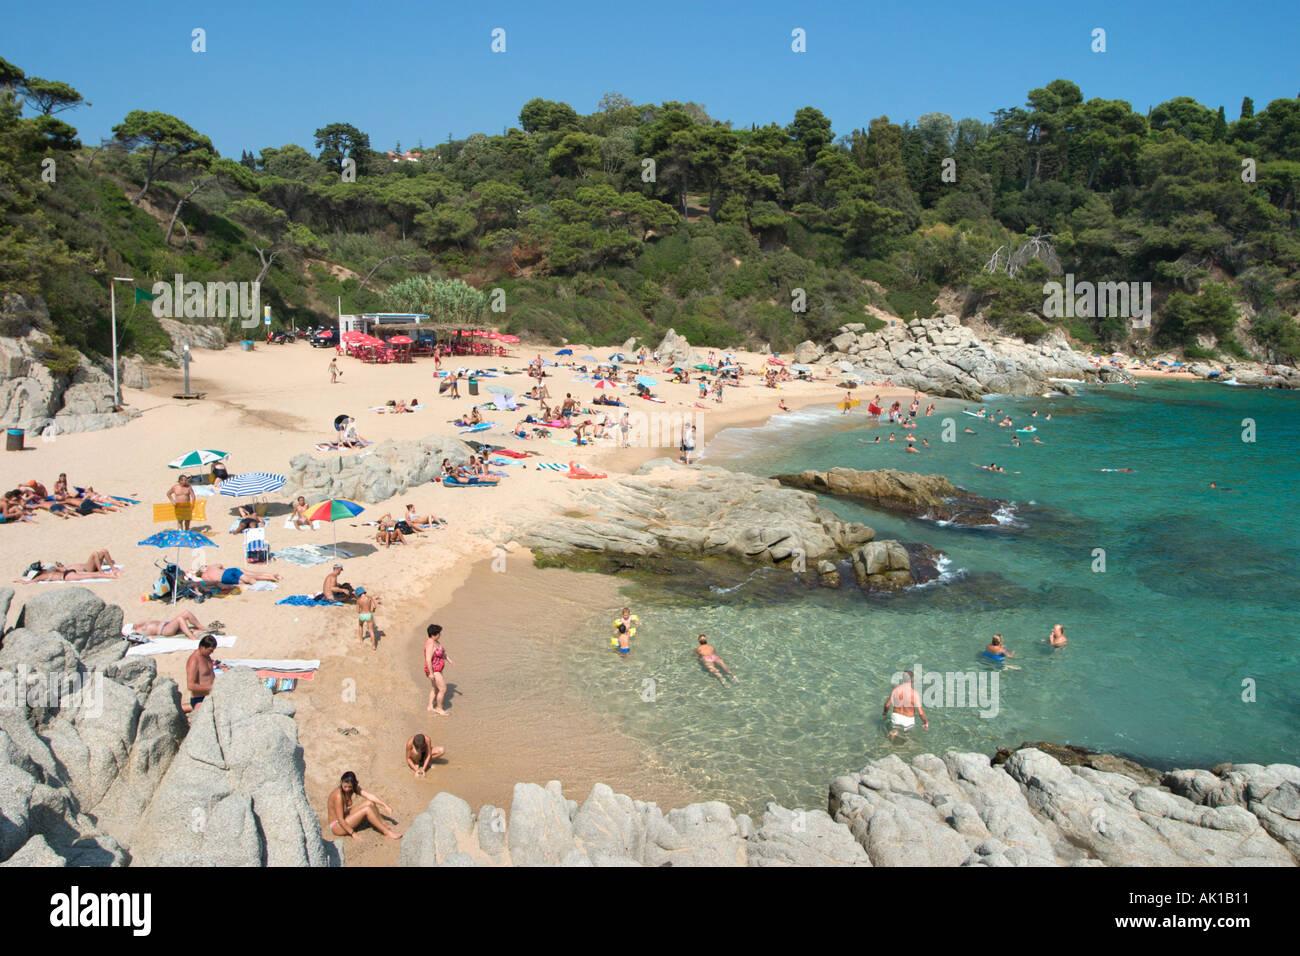 Small beach of Sa Boadella south west of Lloret de Mar, Costa Brava, Catalunya, Spain - Stock Image